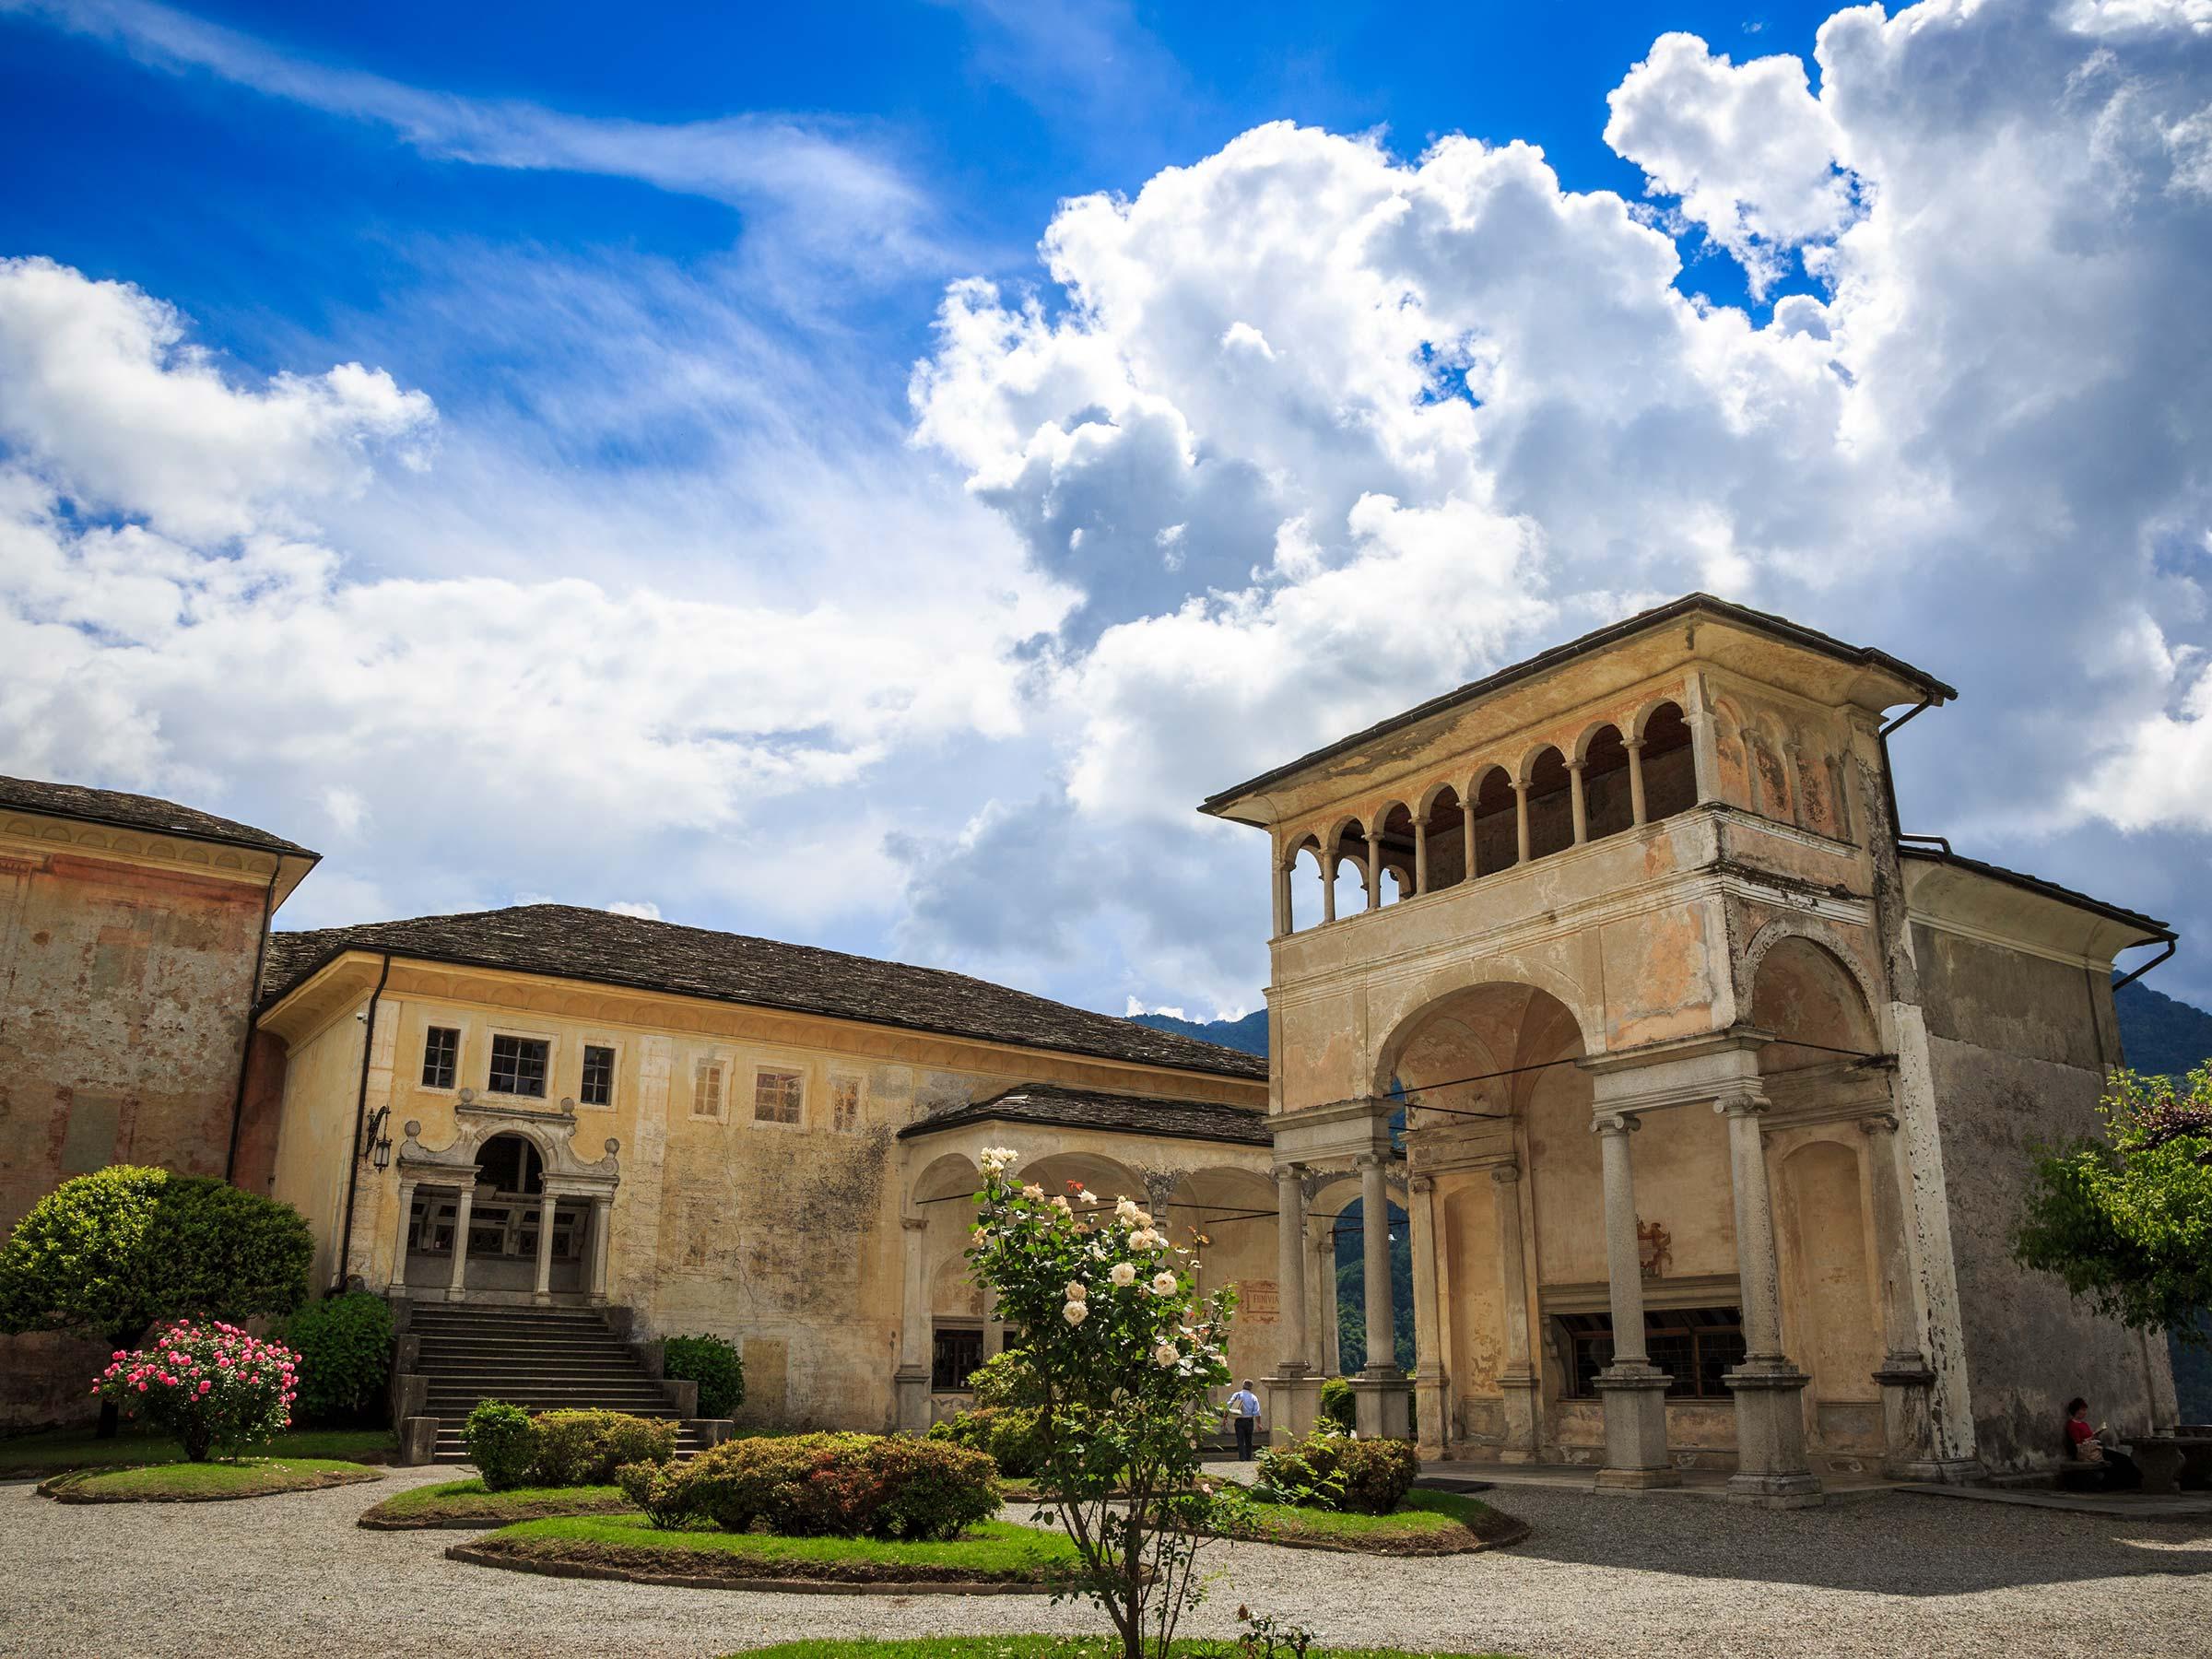 Sacro Monte di Varallo piazza tribunali